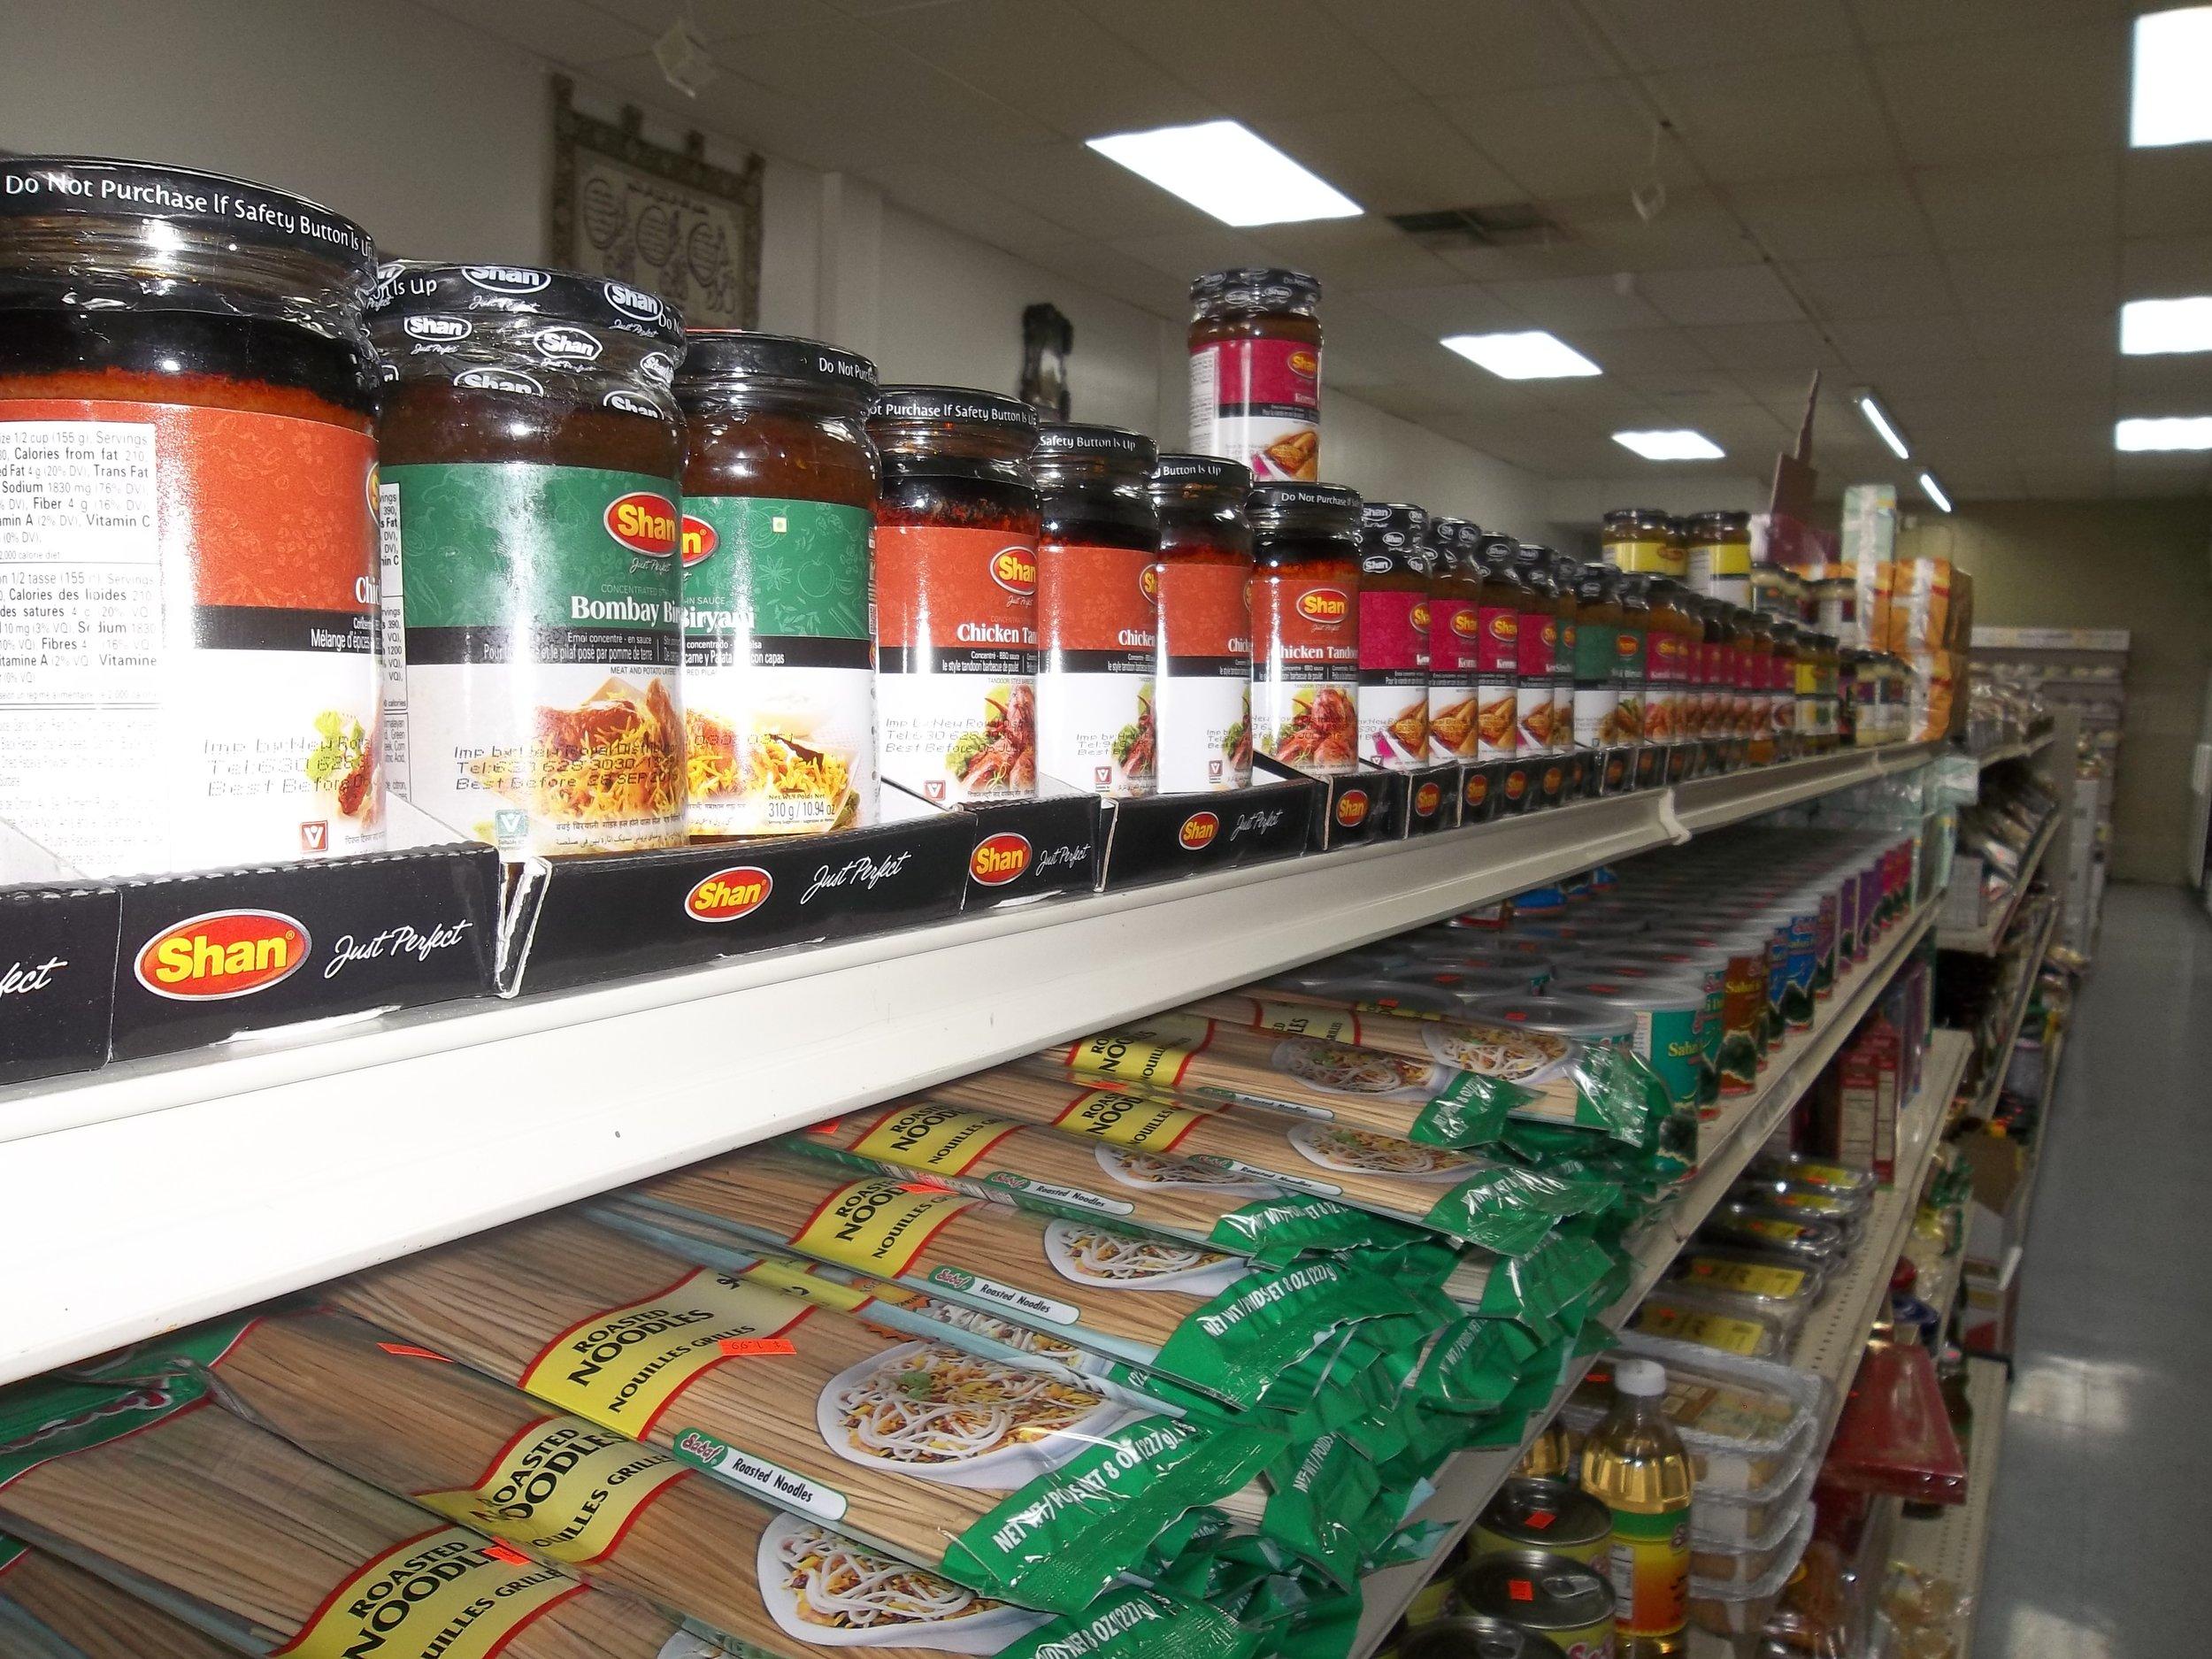 Canned-Chicken-Tandori-Pak-Halal-Mediterranean- Grocery-Store-12259-W-87th-St-Pkwy-Lenexa-KS-66215.JPG